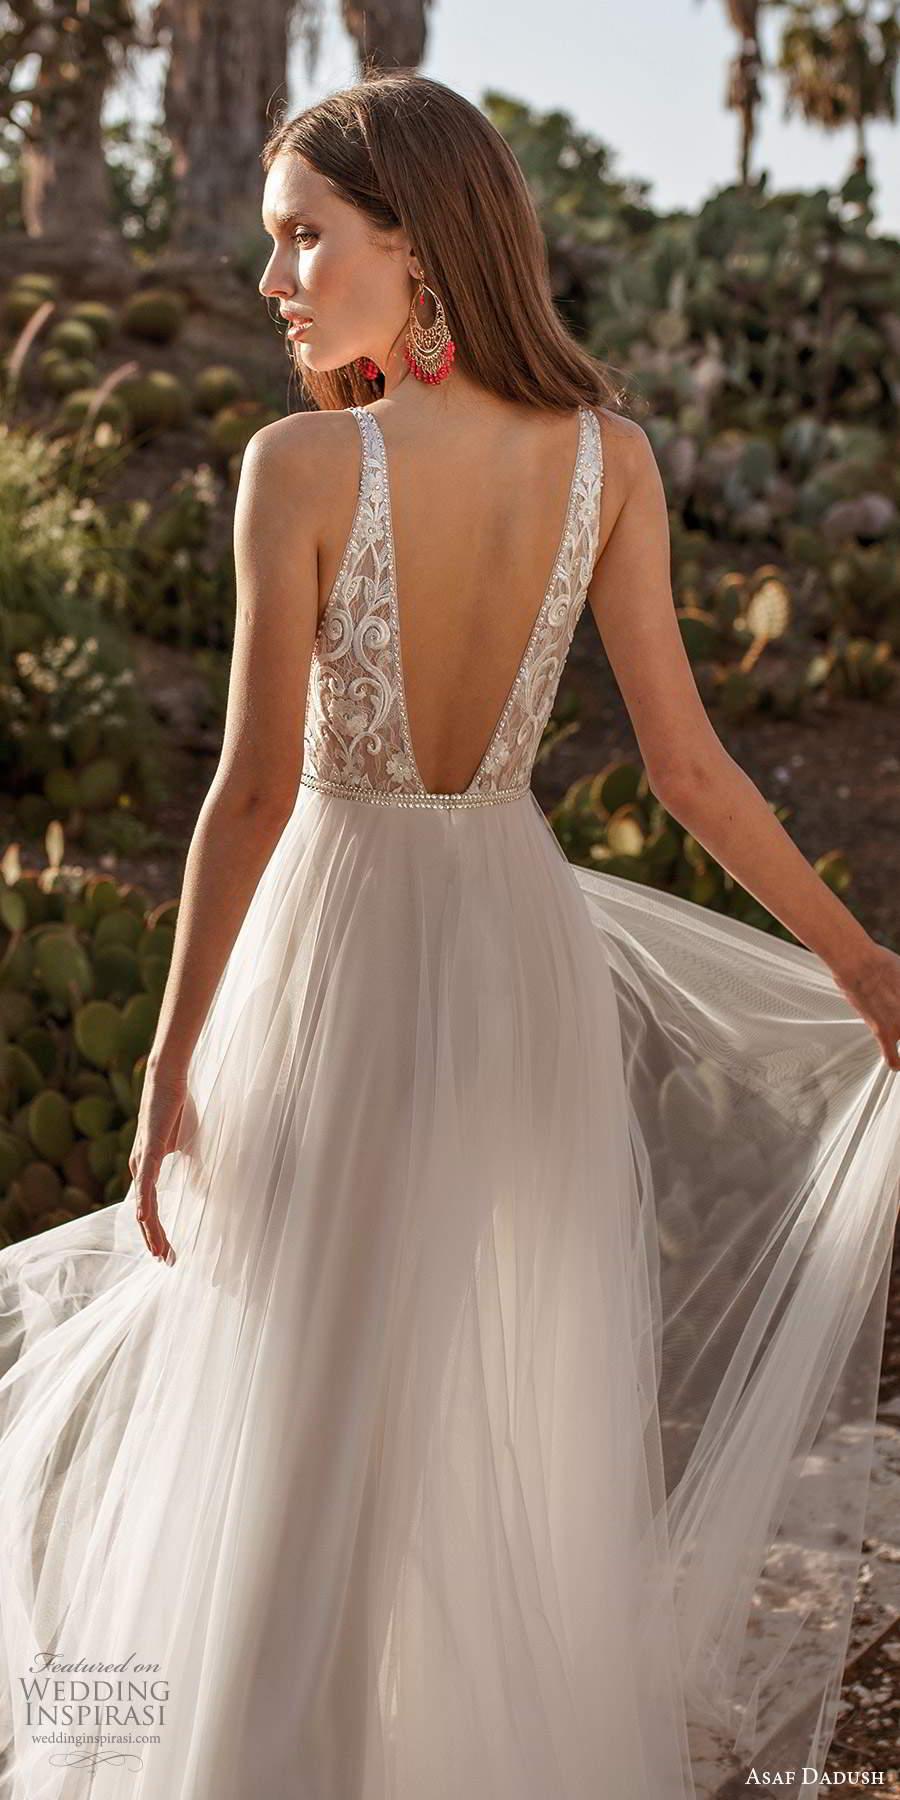 asaf dadush 2020 bridal sleeveless straps plunging v neckline heavily embellished bodice a line ball gown wedding dress v back (10) bv